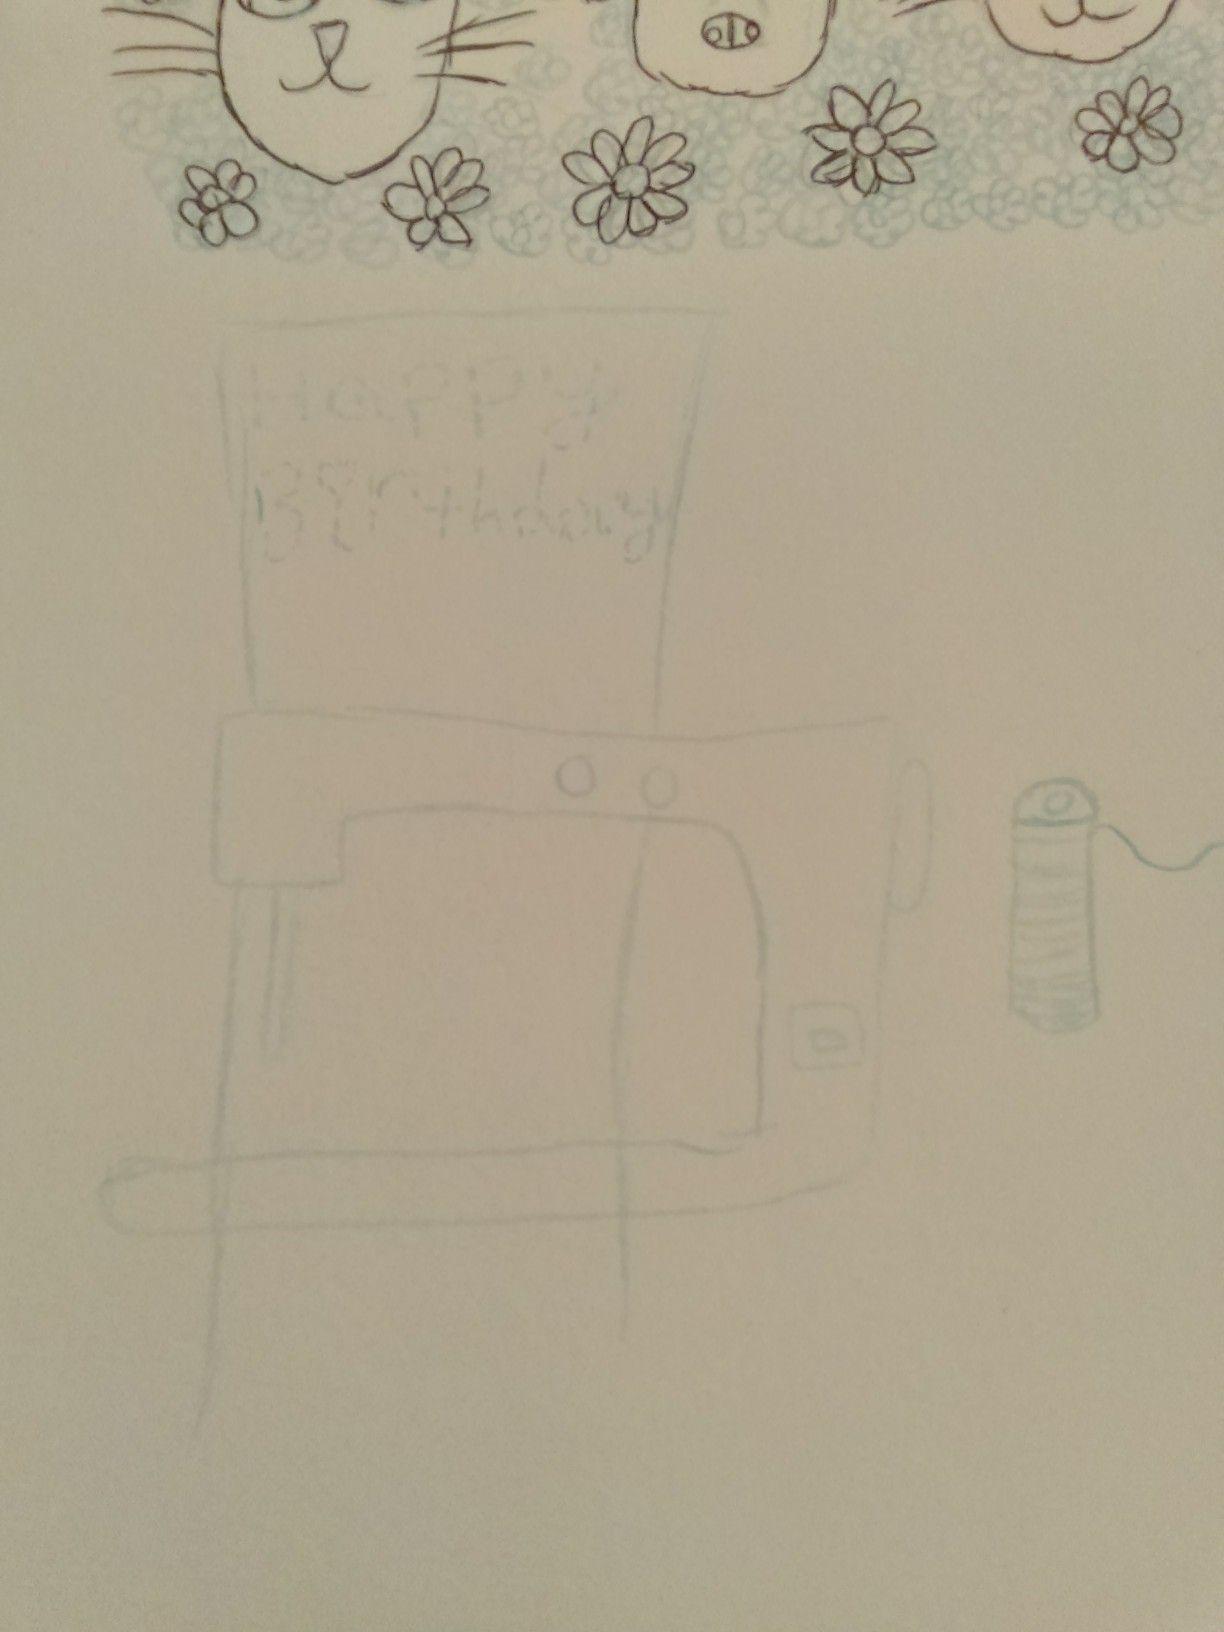 A blue pencil sketch of a family friend birthday card